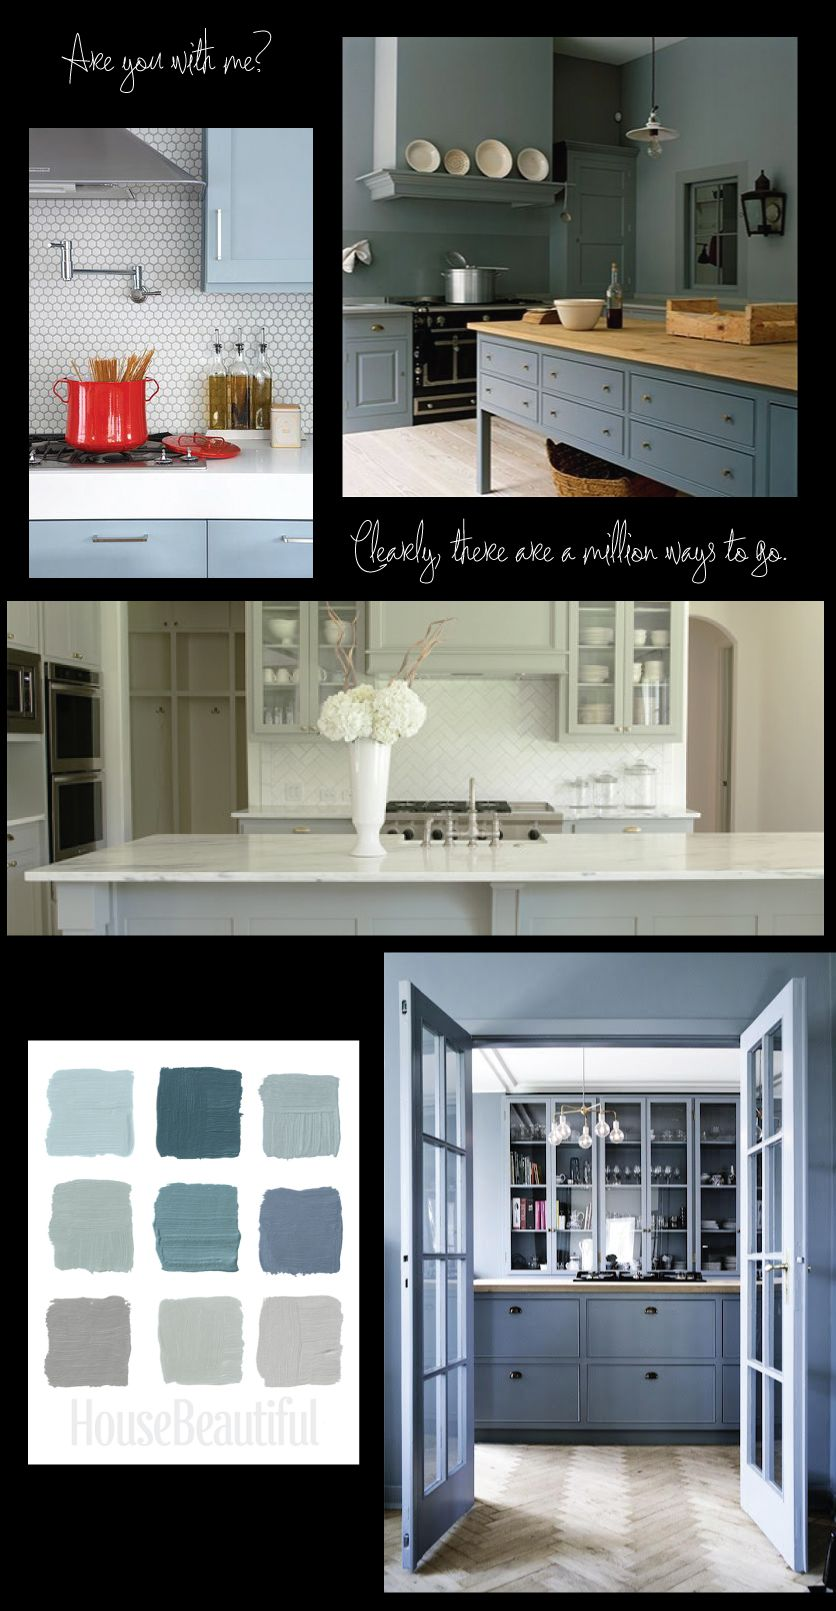 Greenish-Grey and Blue-Grey Kitchen Cabinets